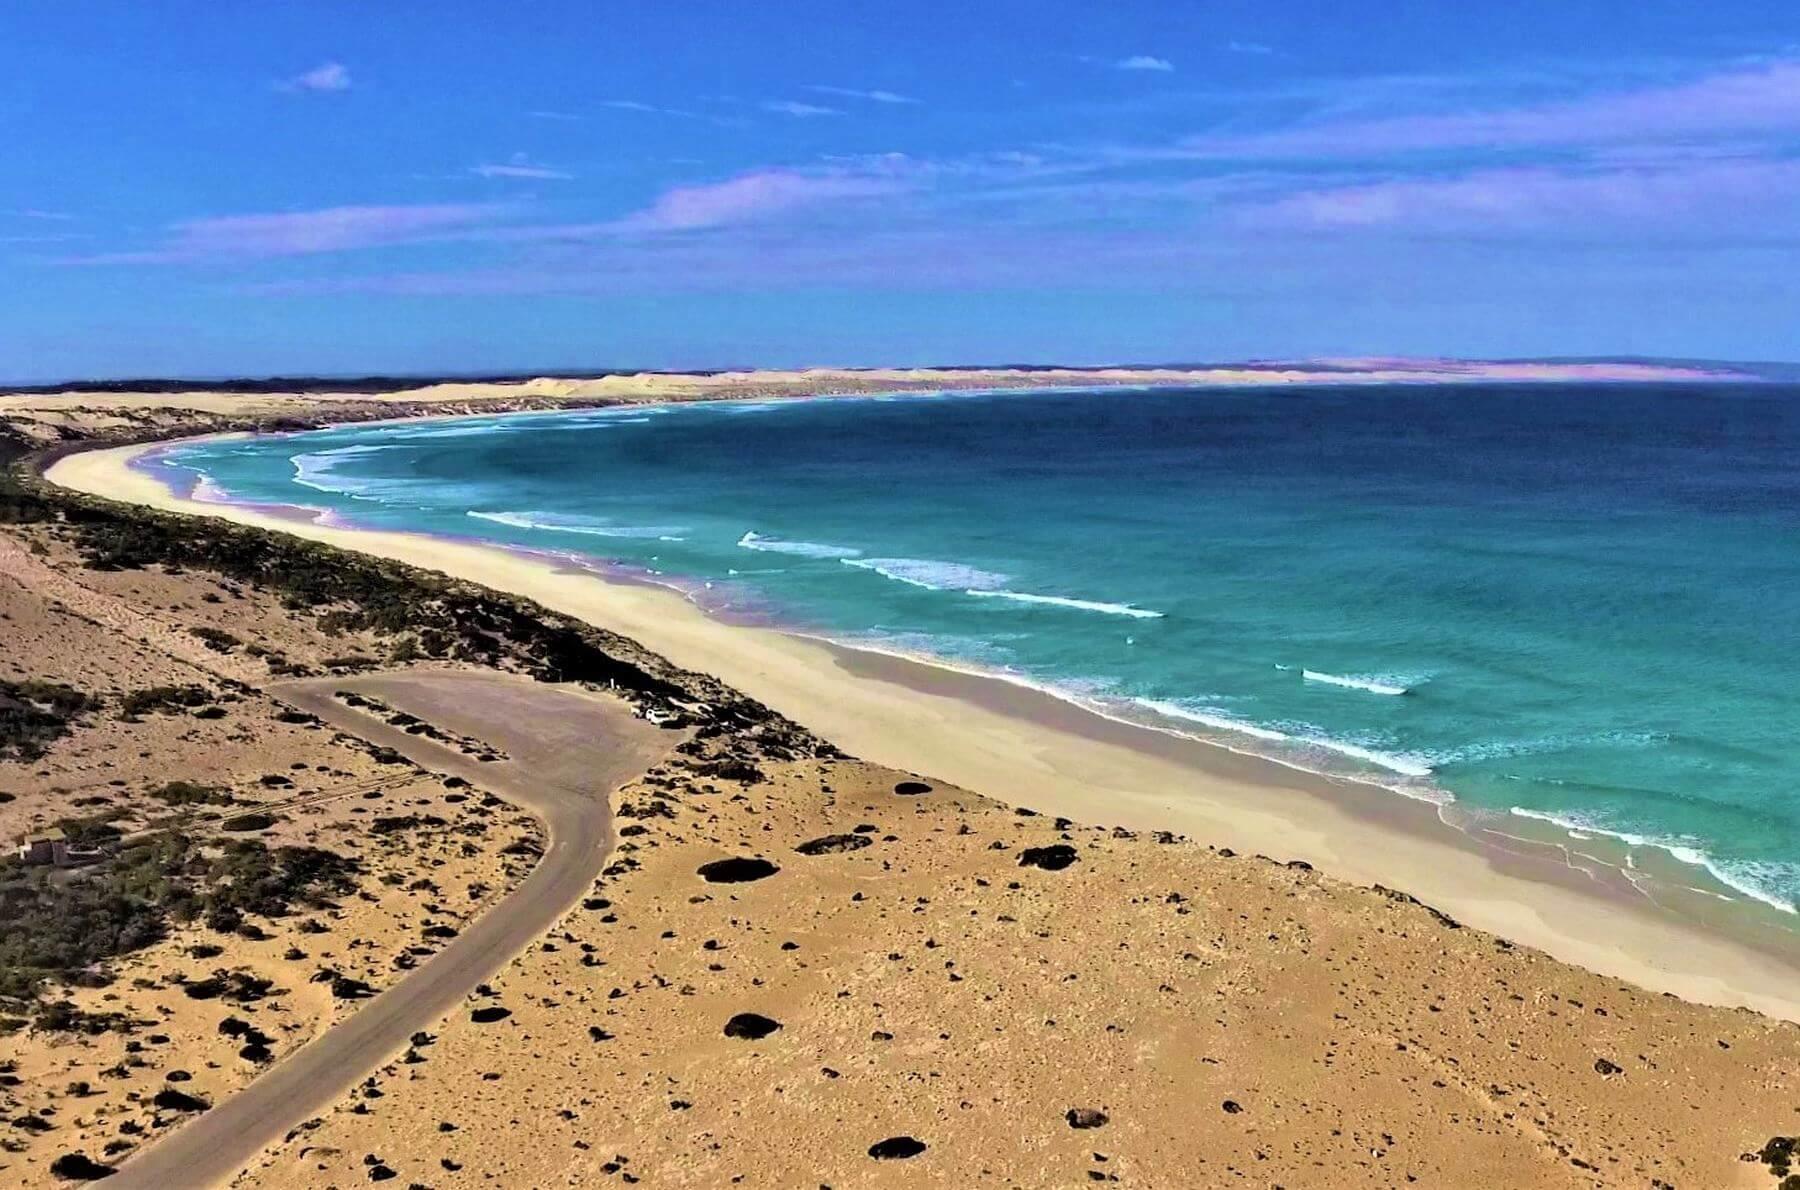 Strand im Coffin Bay National Park in Australien